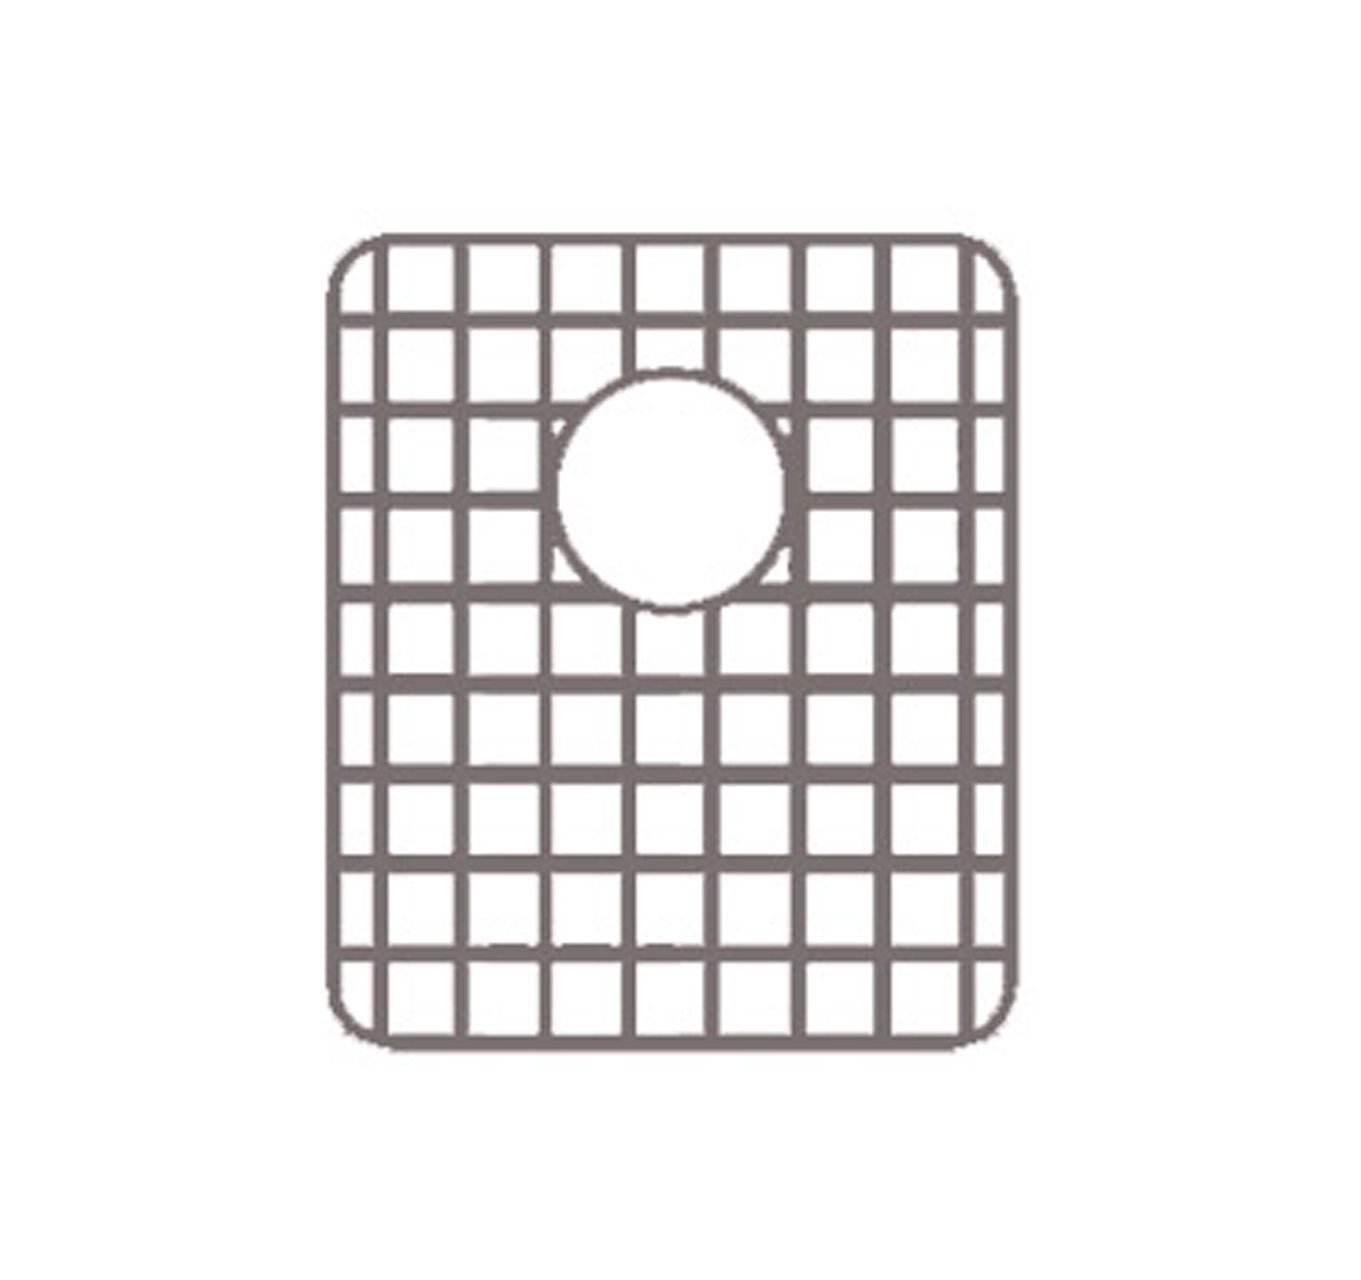 Alfi commercio whnc3220sg lavandino in acciaio inox grid- in acciaio inox